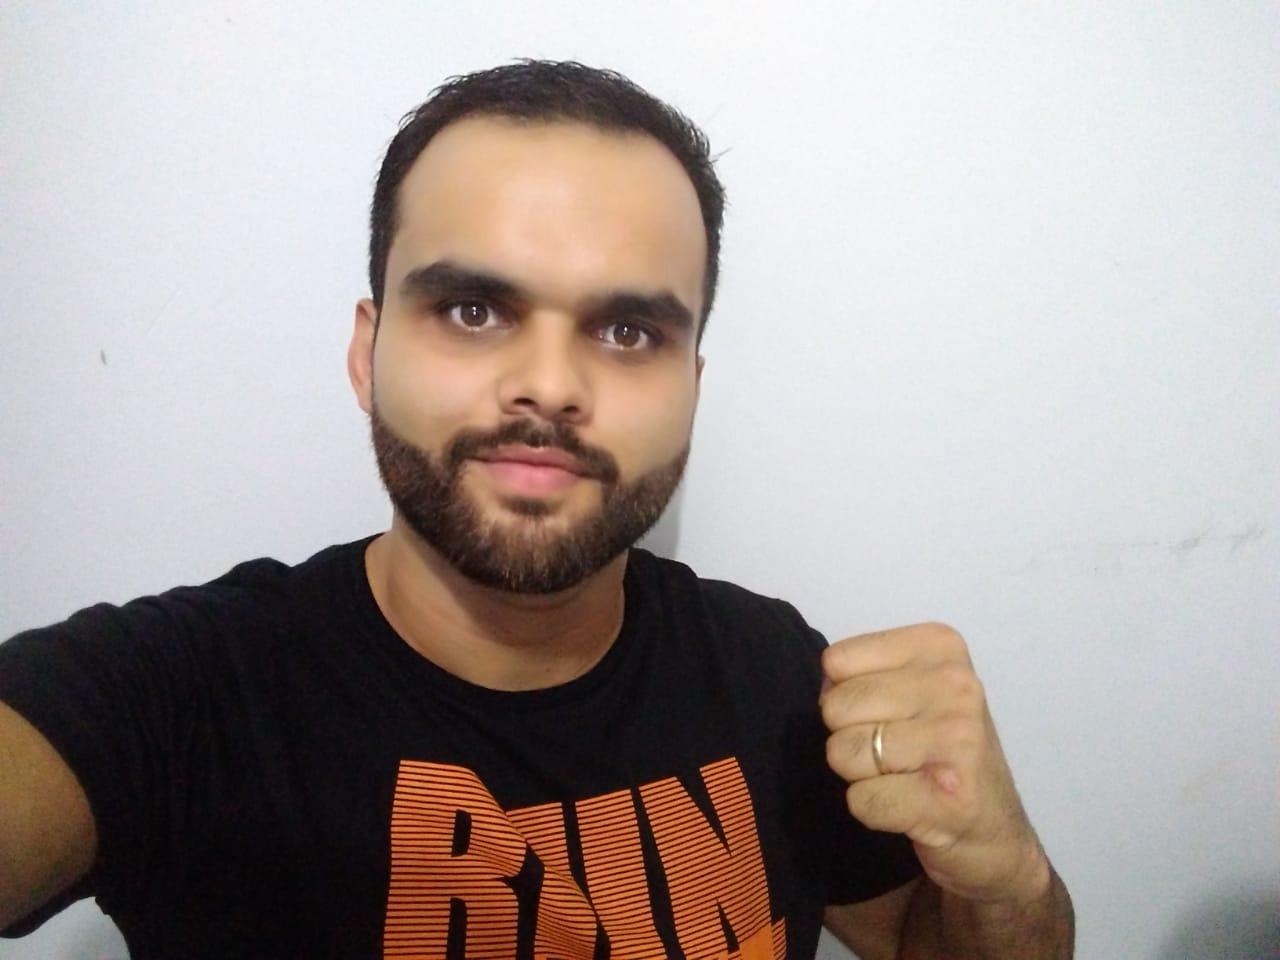 ENTREVISTA: André Augusto Barcelos - Aprovado no concurso da Polícia Civil do Pará no cargo de Investigador